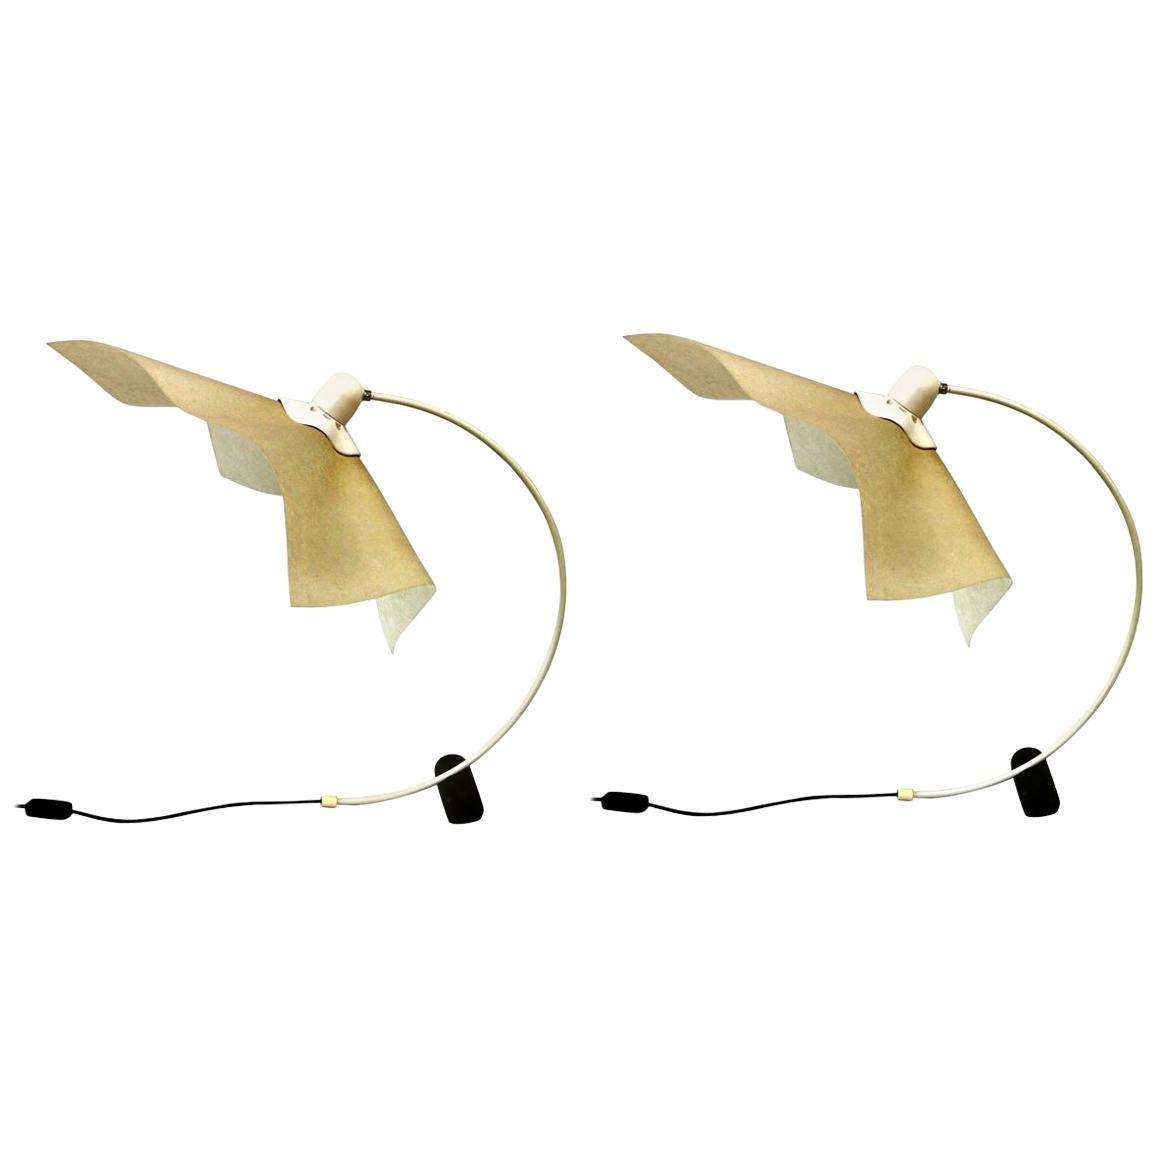 Pair of Italian Mid-Century Modern Table/Desk Lamps 'Area 50' by Mario Bellini